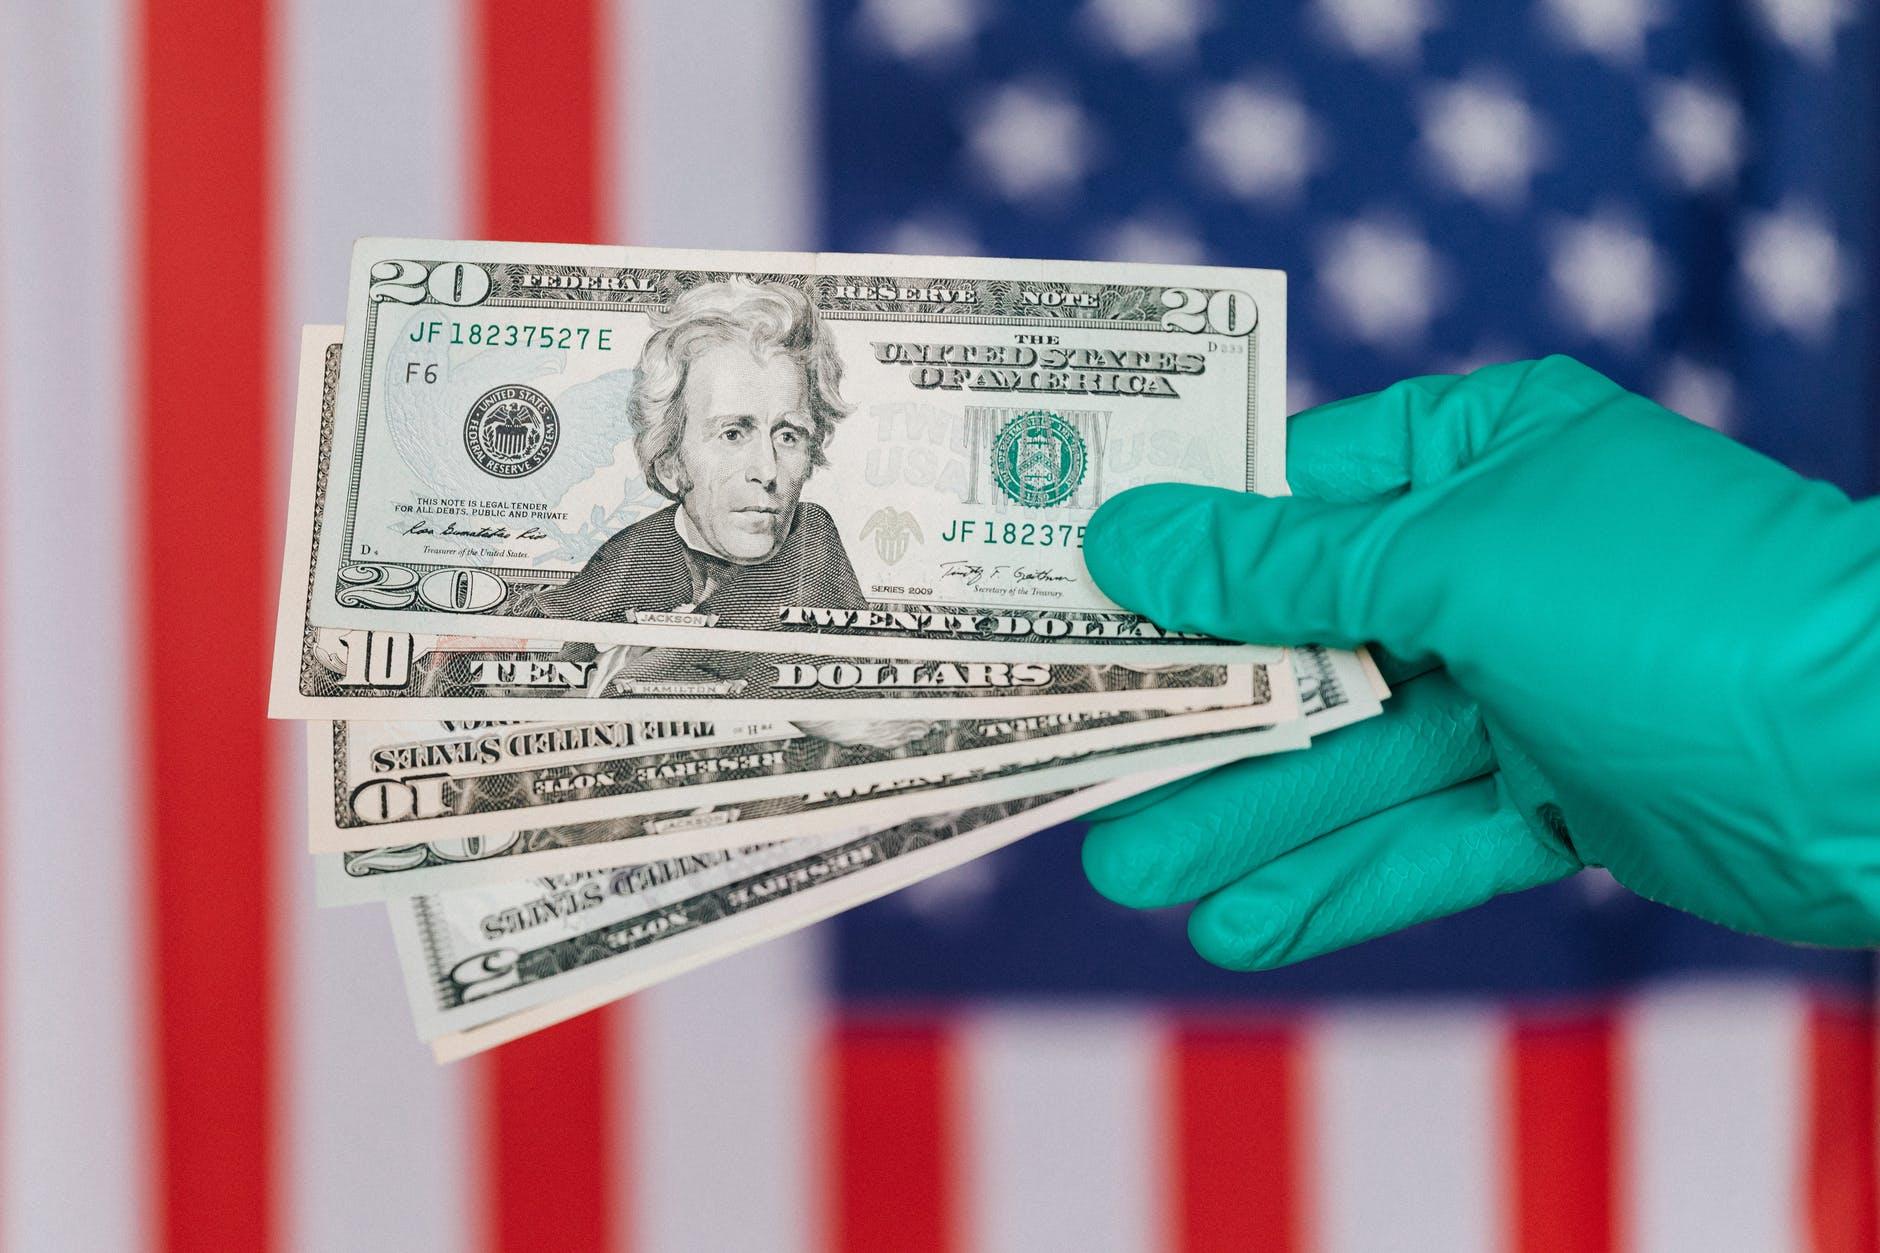 americké dolary na pozadí s vlajkou